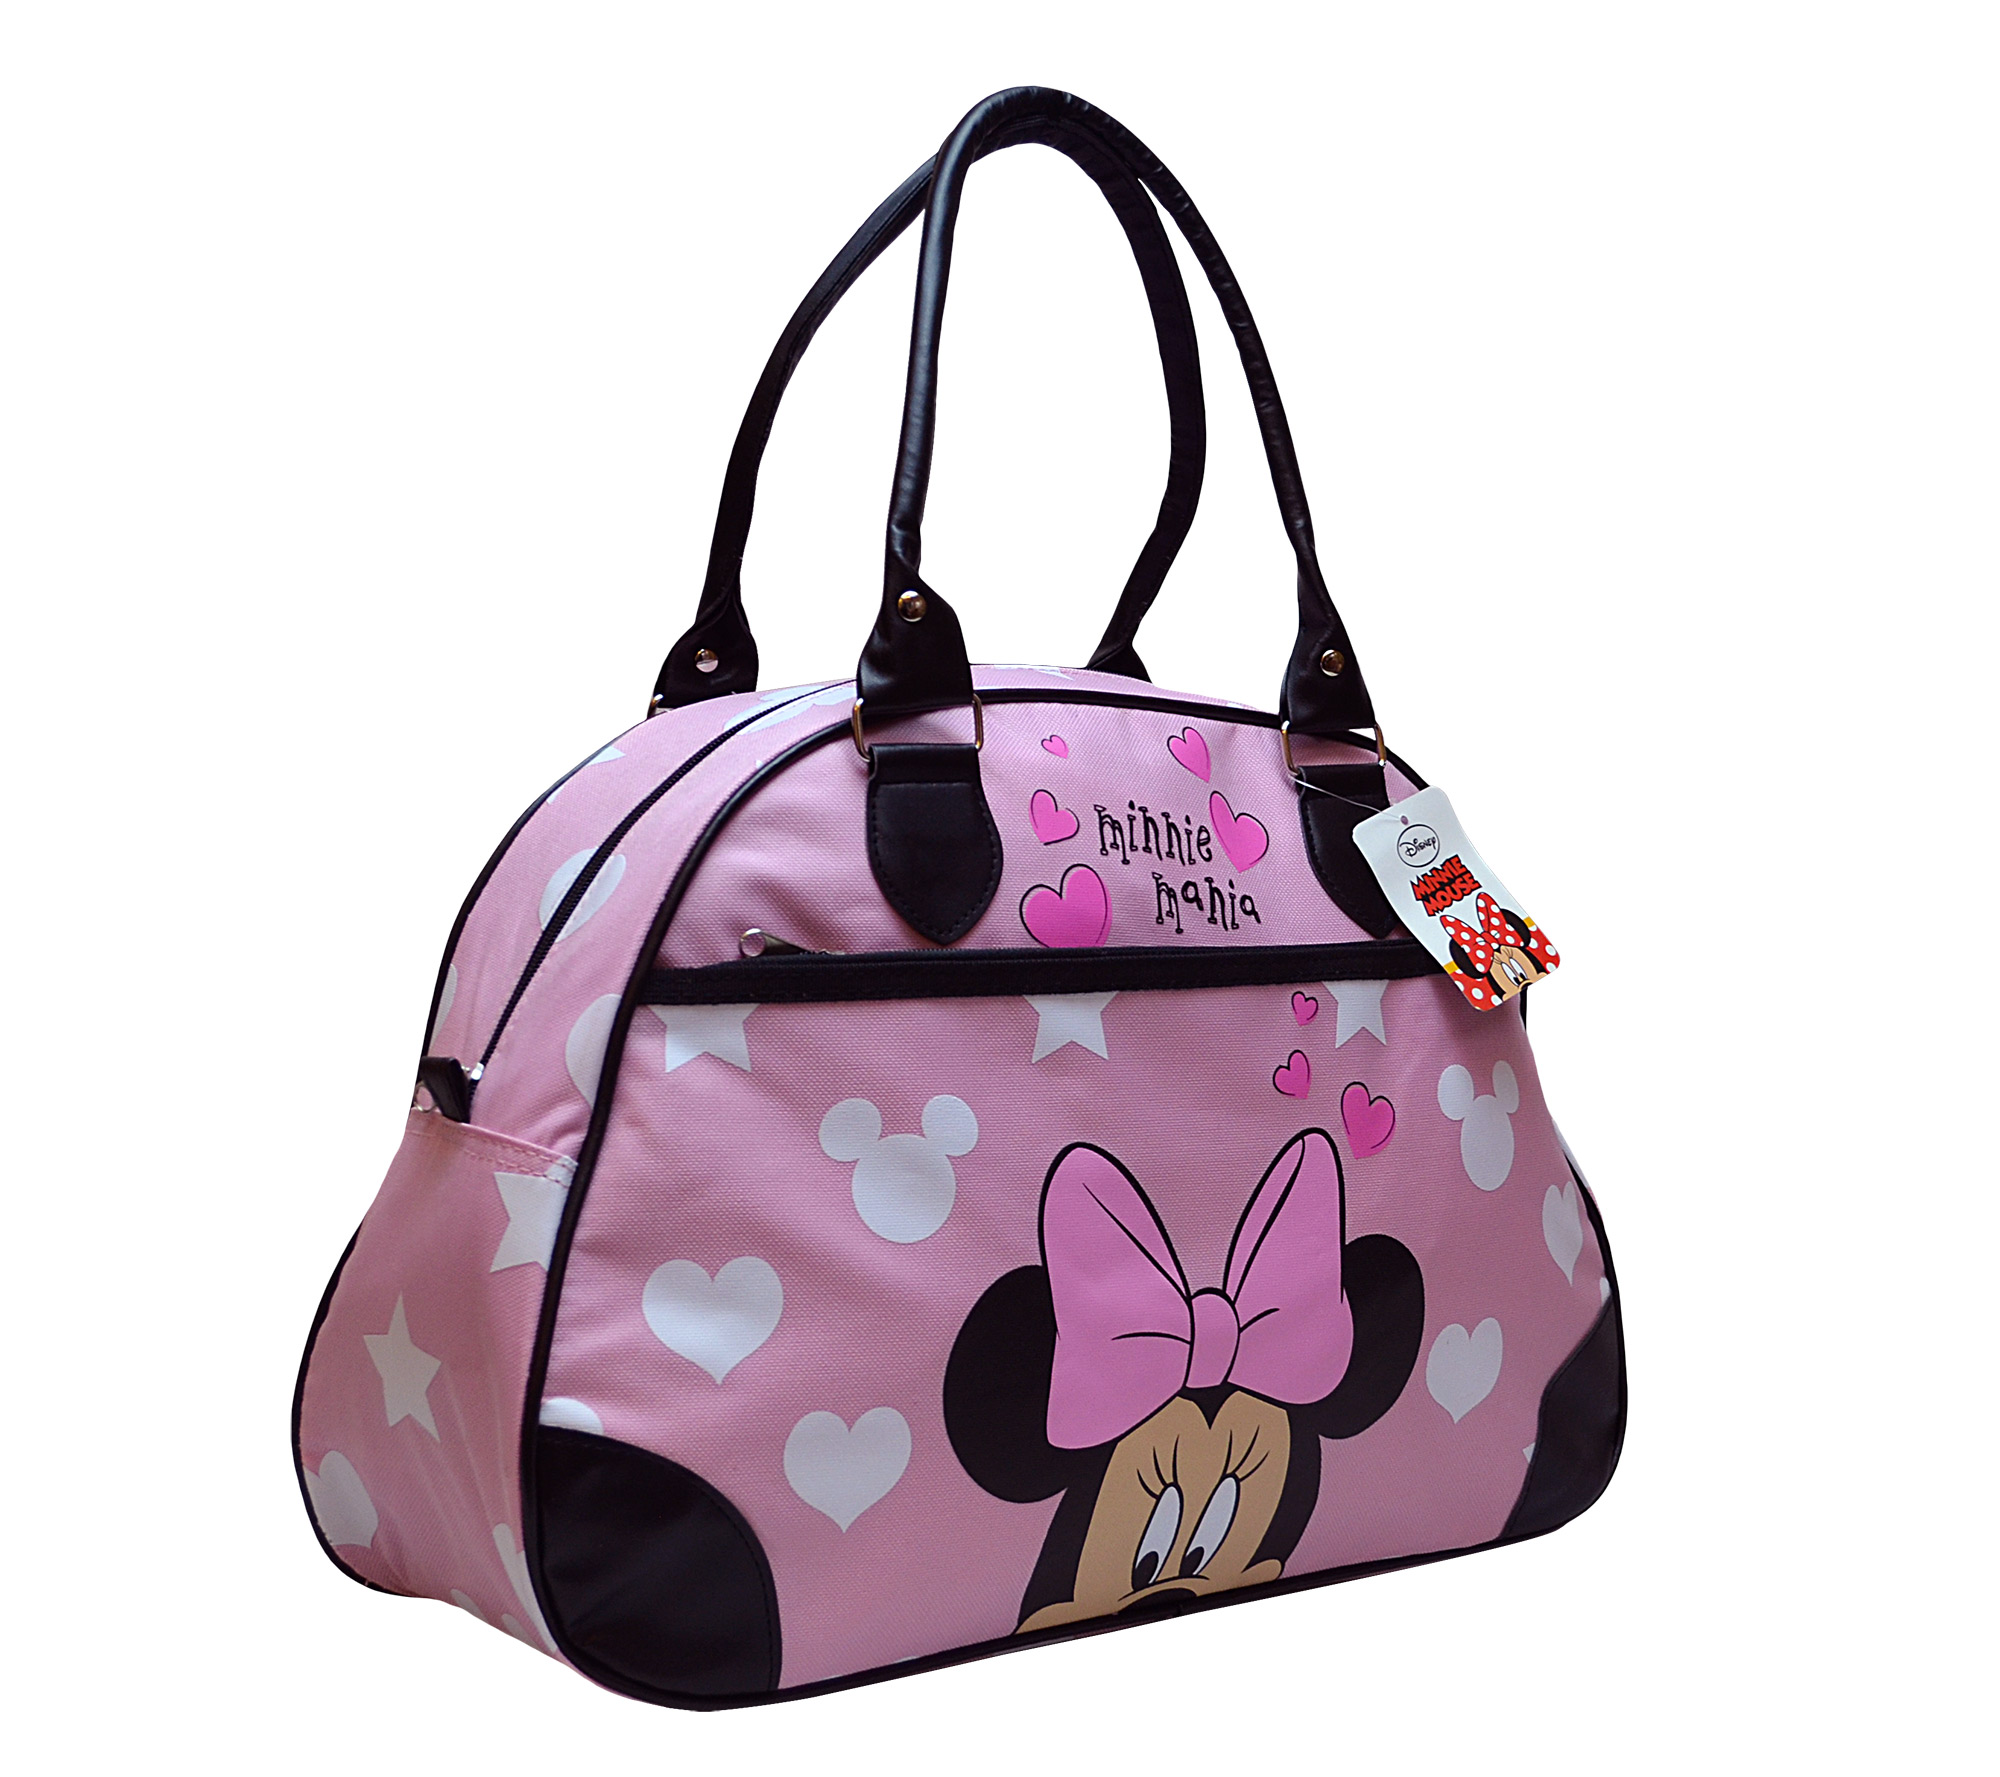 Disney Minnie Mouse Girls Holdall Overnight Travel Bowling School Shoulder Bag